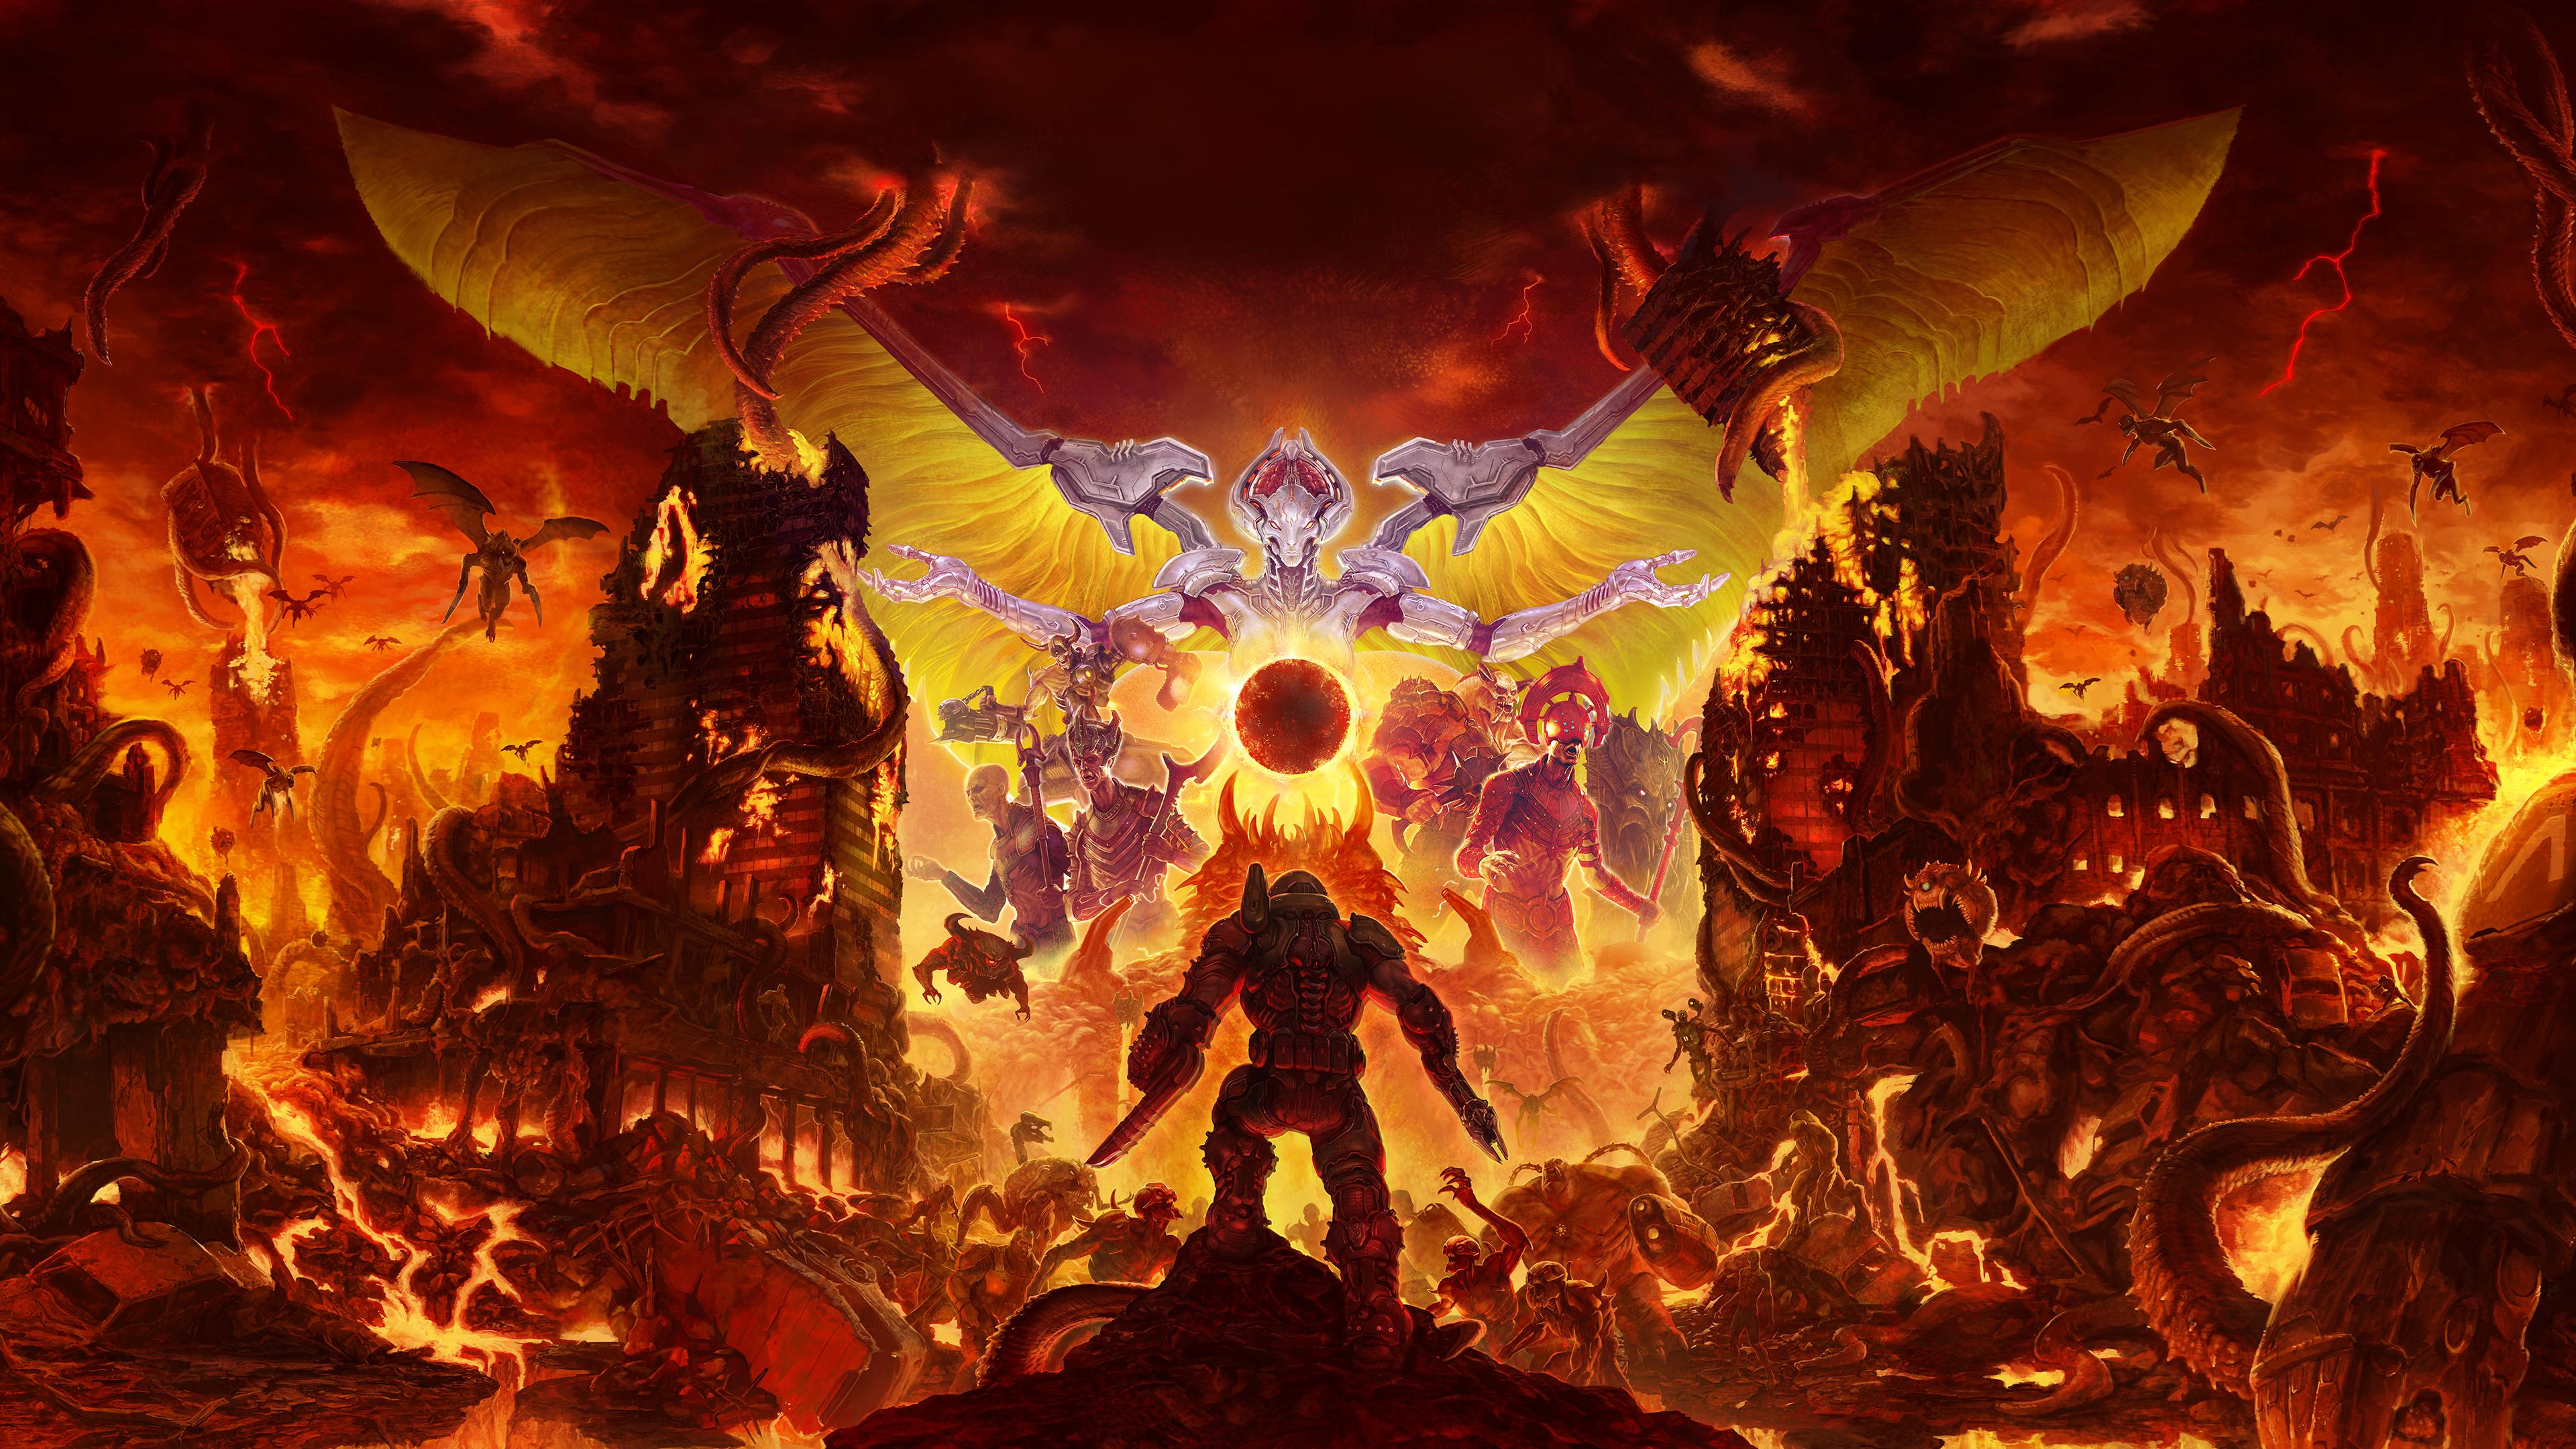 General 3840x2160 Doom (game) DOOM Eternal hell demon video games Bethesda Softworks Id Software artwork